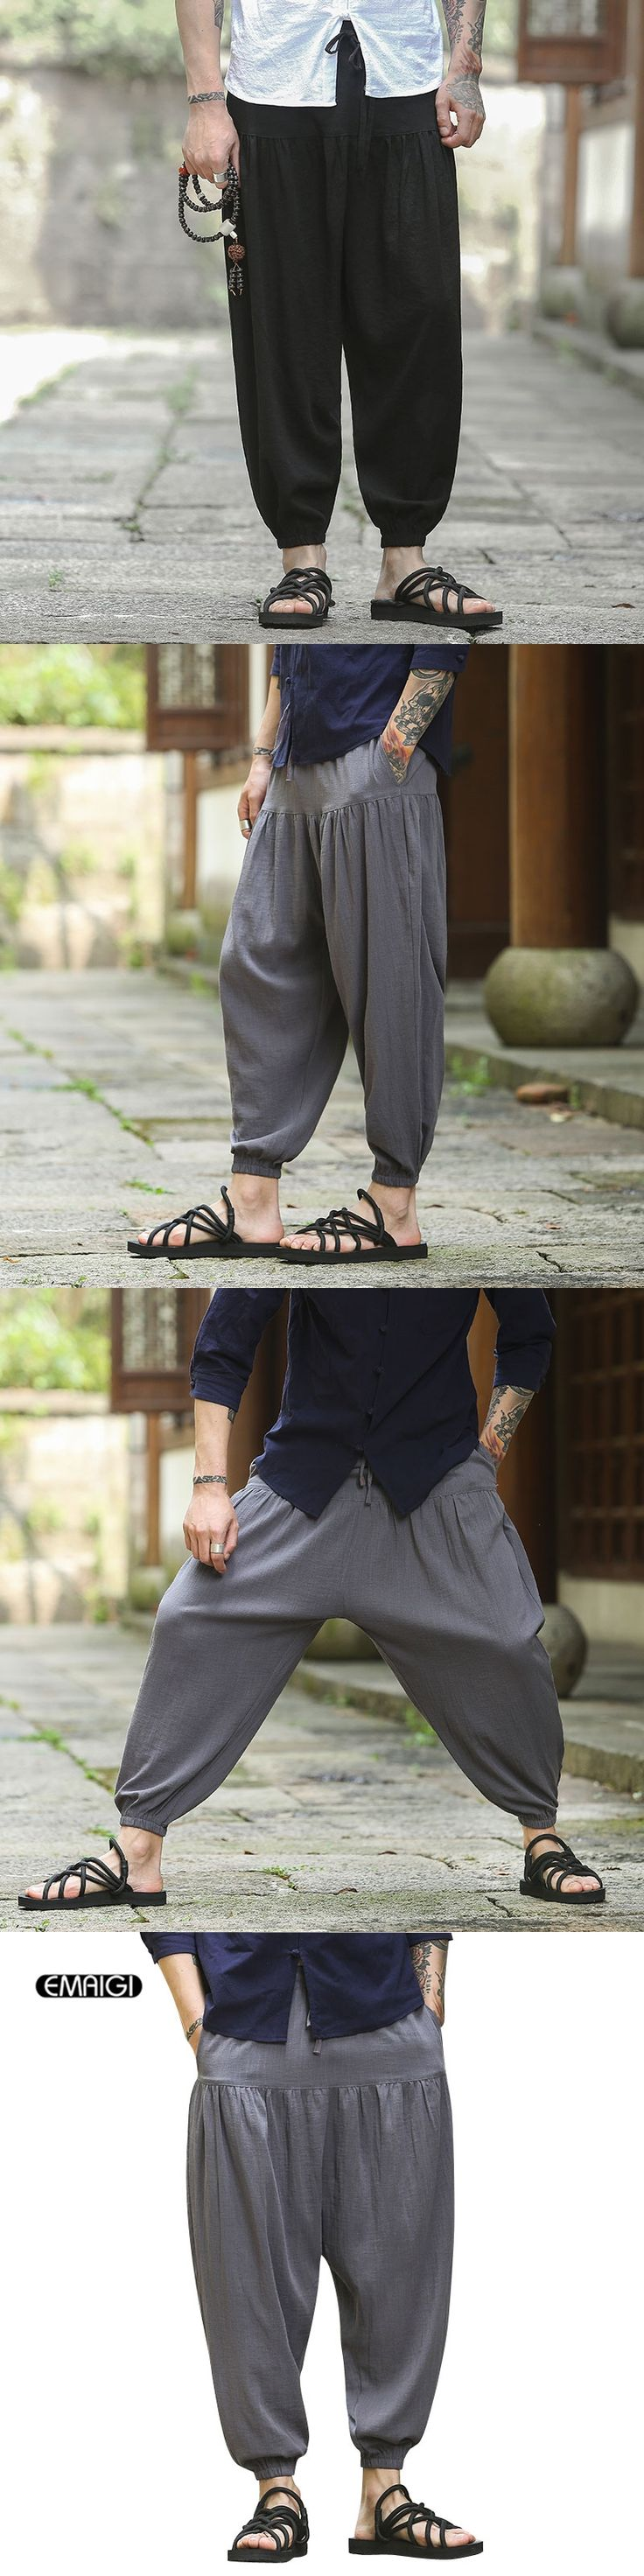 Nepal Style Men Women Loose Casual Pants Cotton Linen Punk Male Wide Leg Skirt Pants Solid Color Thin Trousers